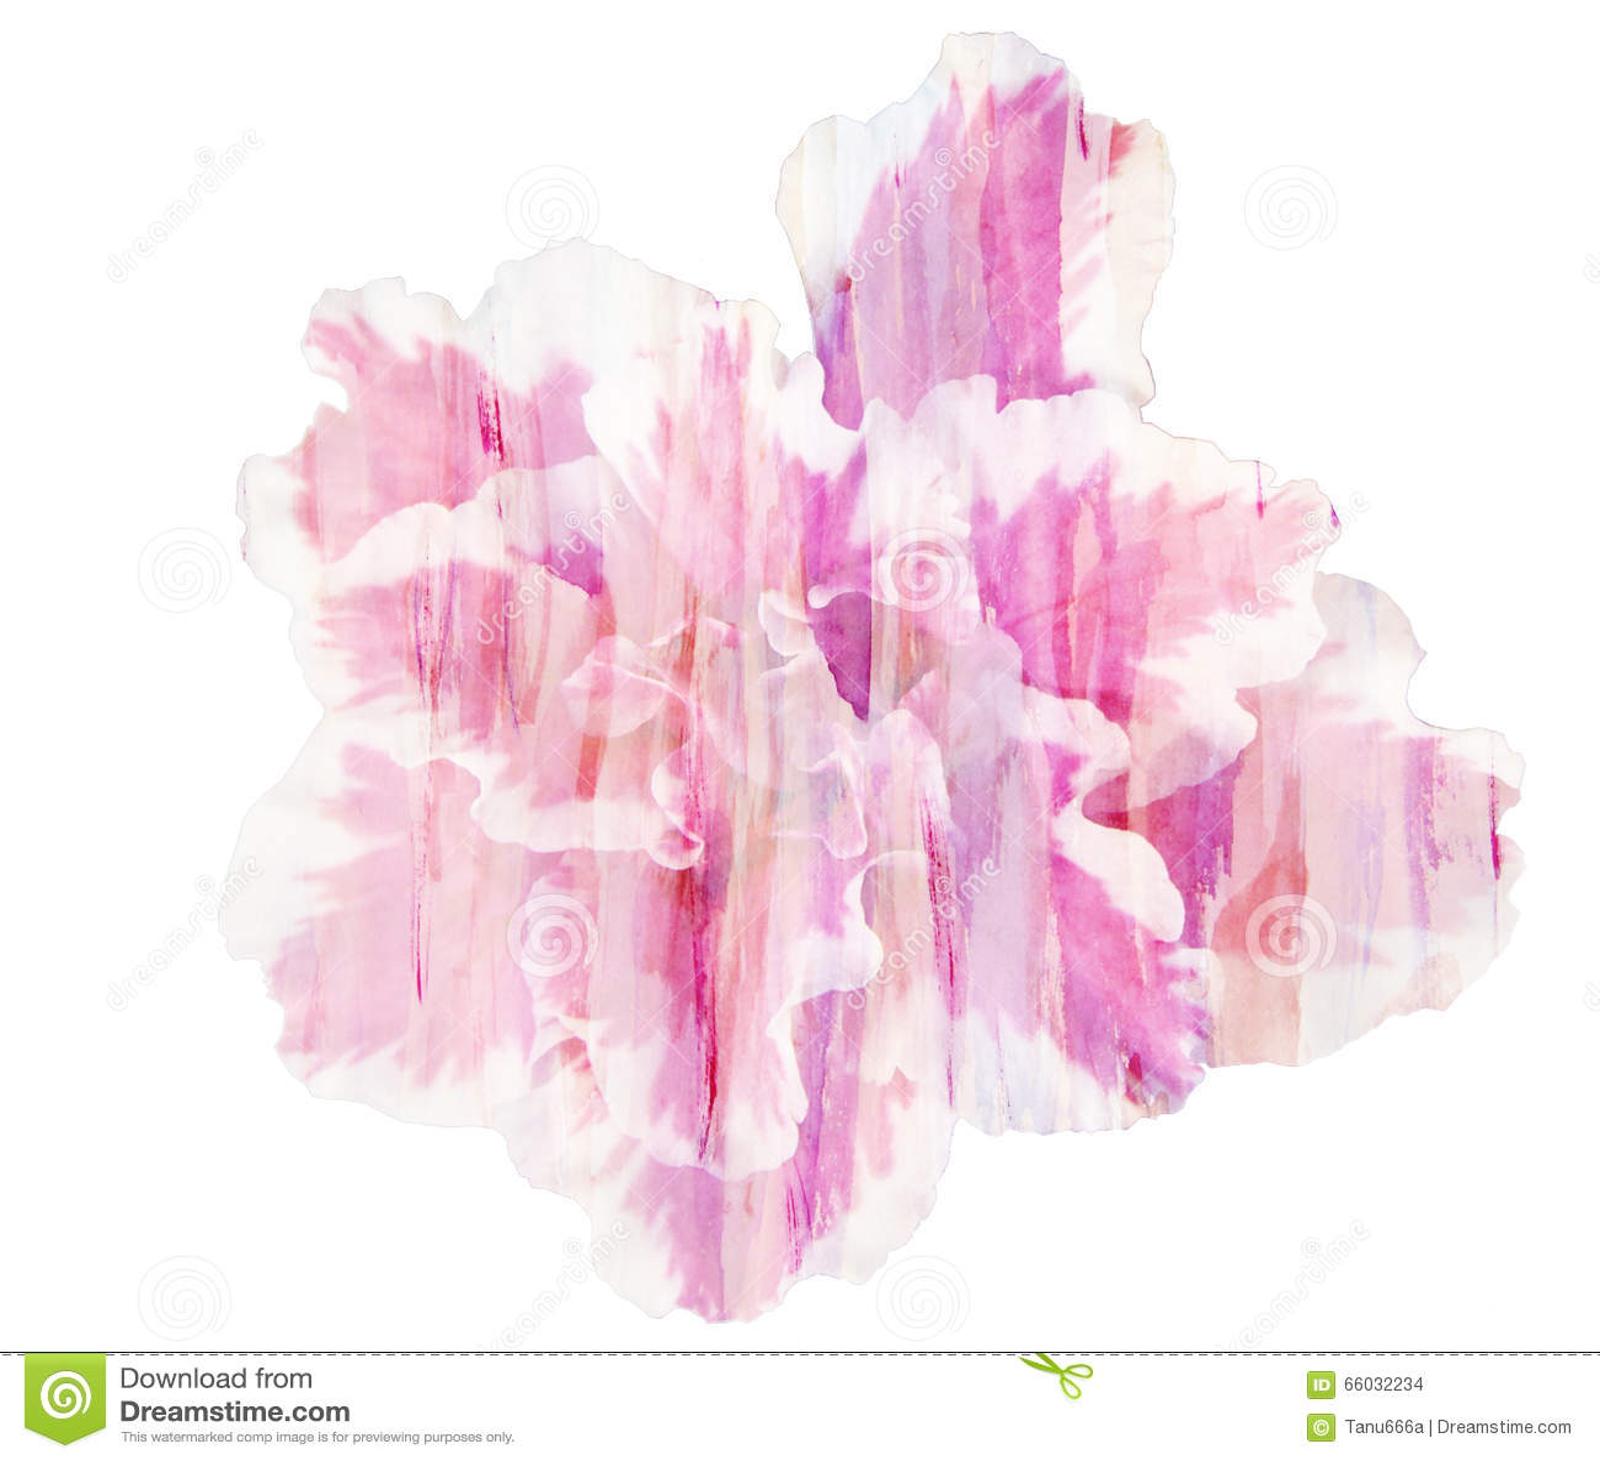 Beautiful Single Pink Flower Azalea Watercolor Illustration